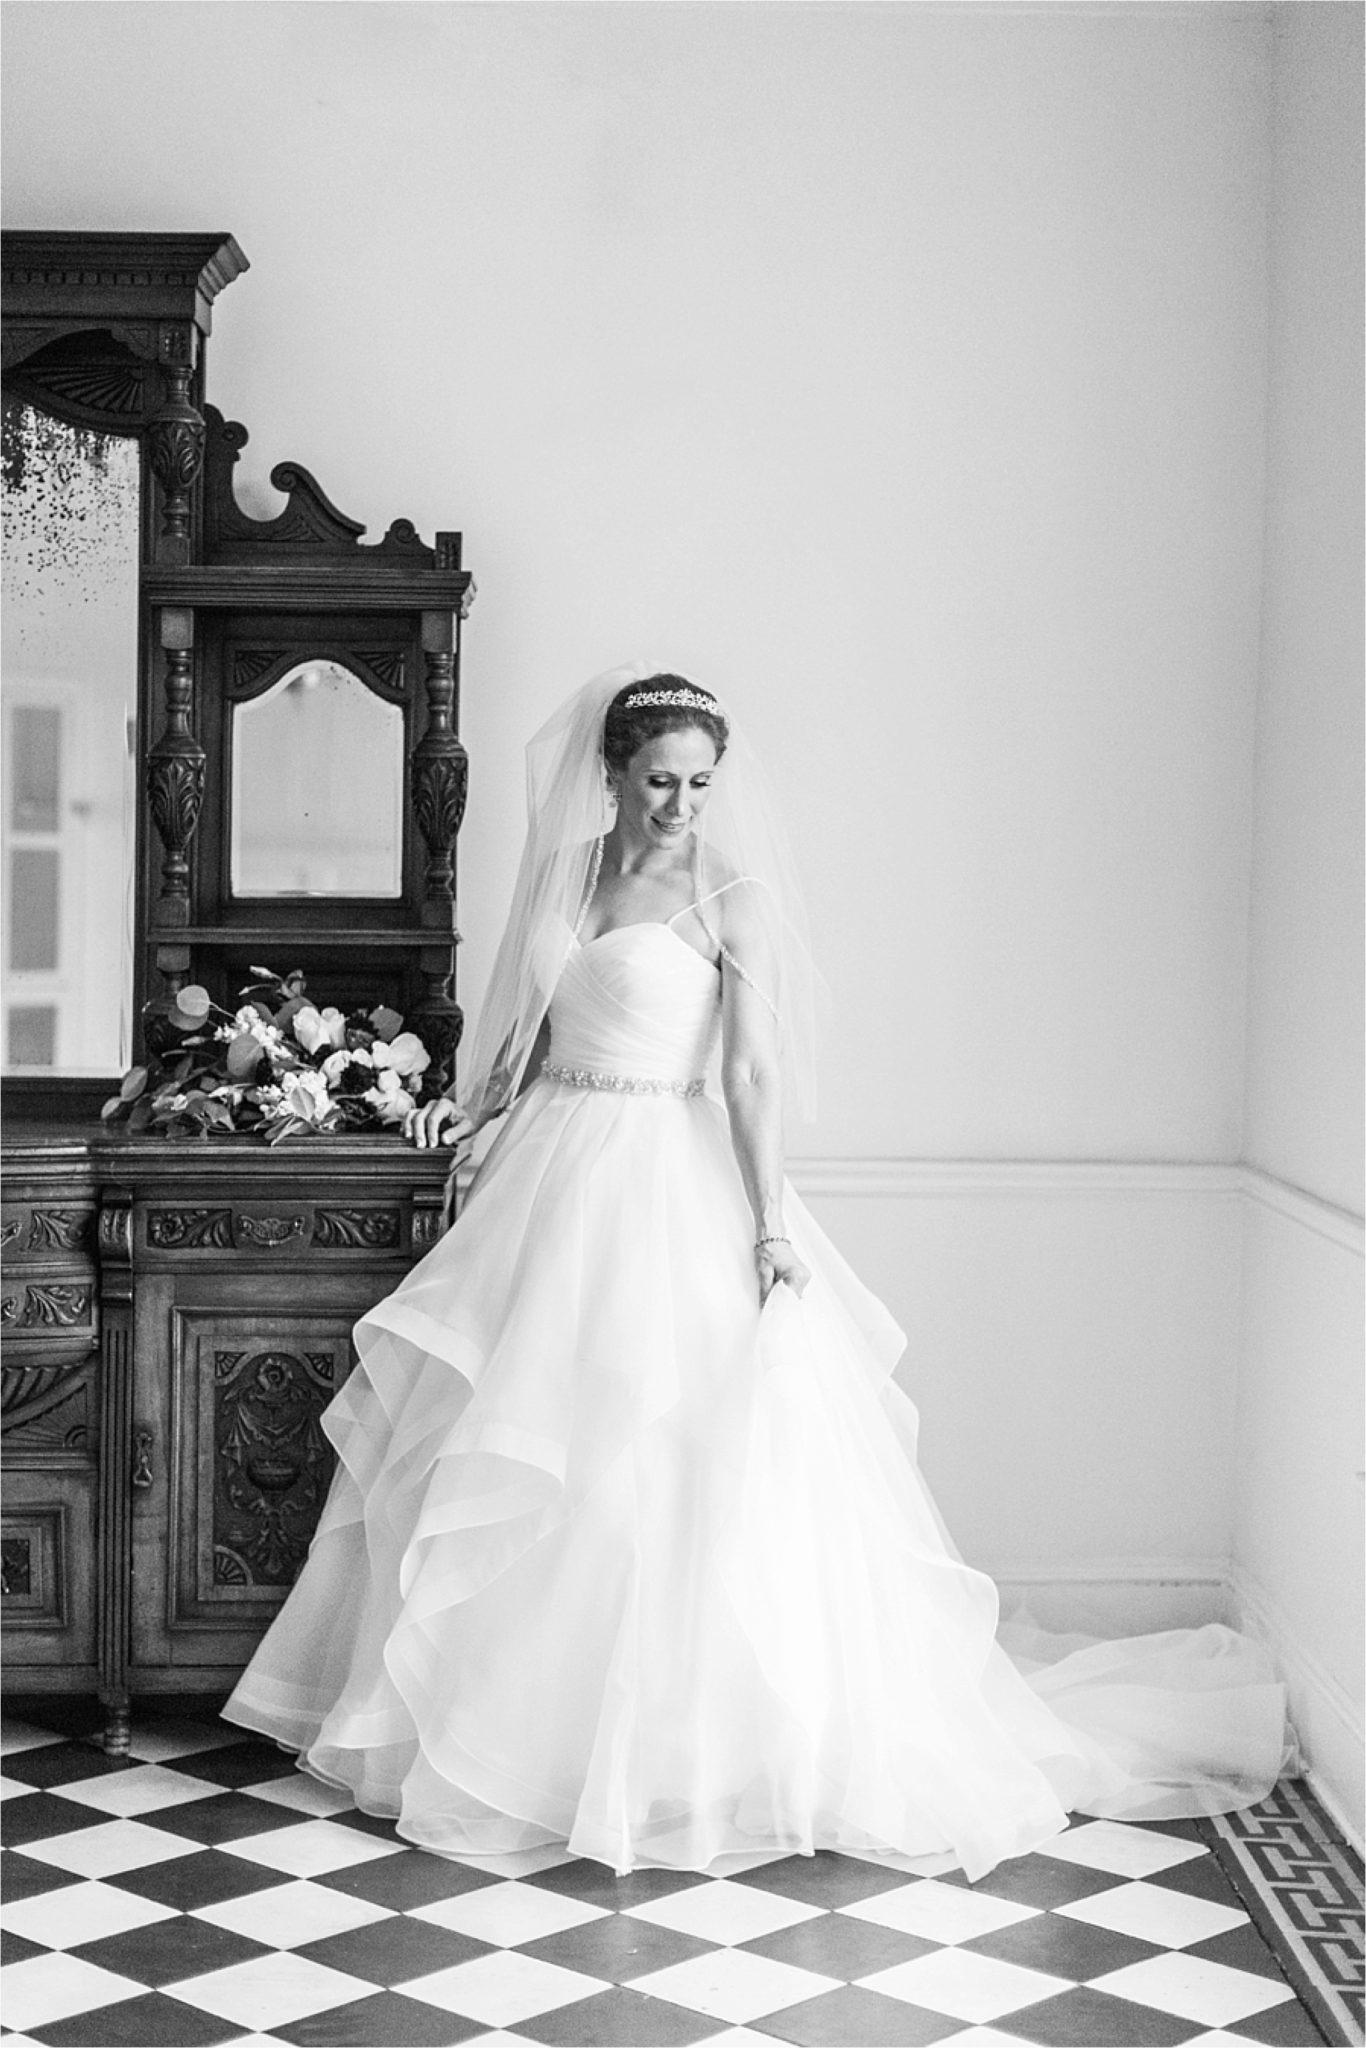 Bridal Session at The Pillars of Mobile-Mobile Alabama Wedding Photographer-Sarra-Bridal session-Wedding dress